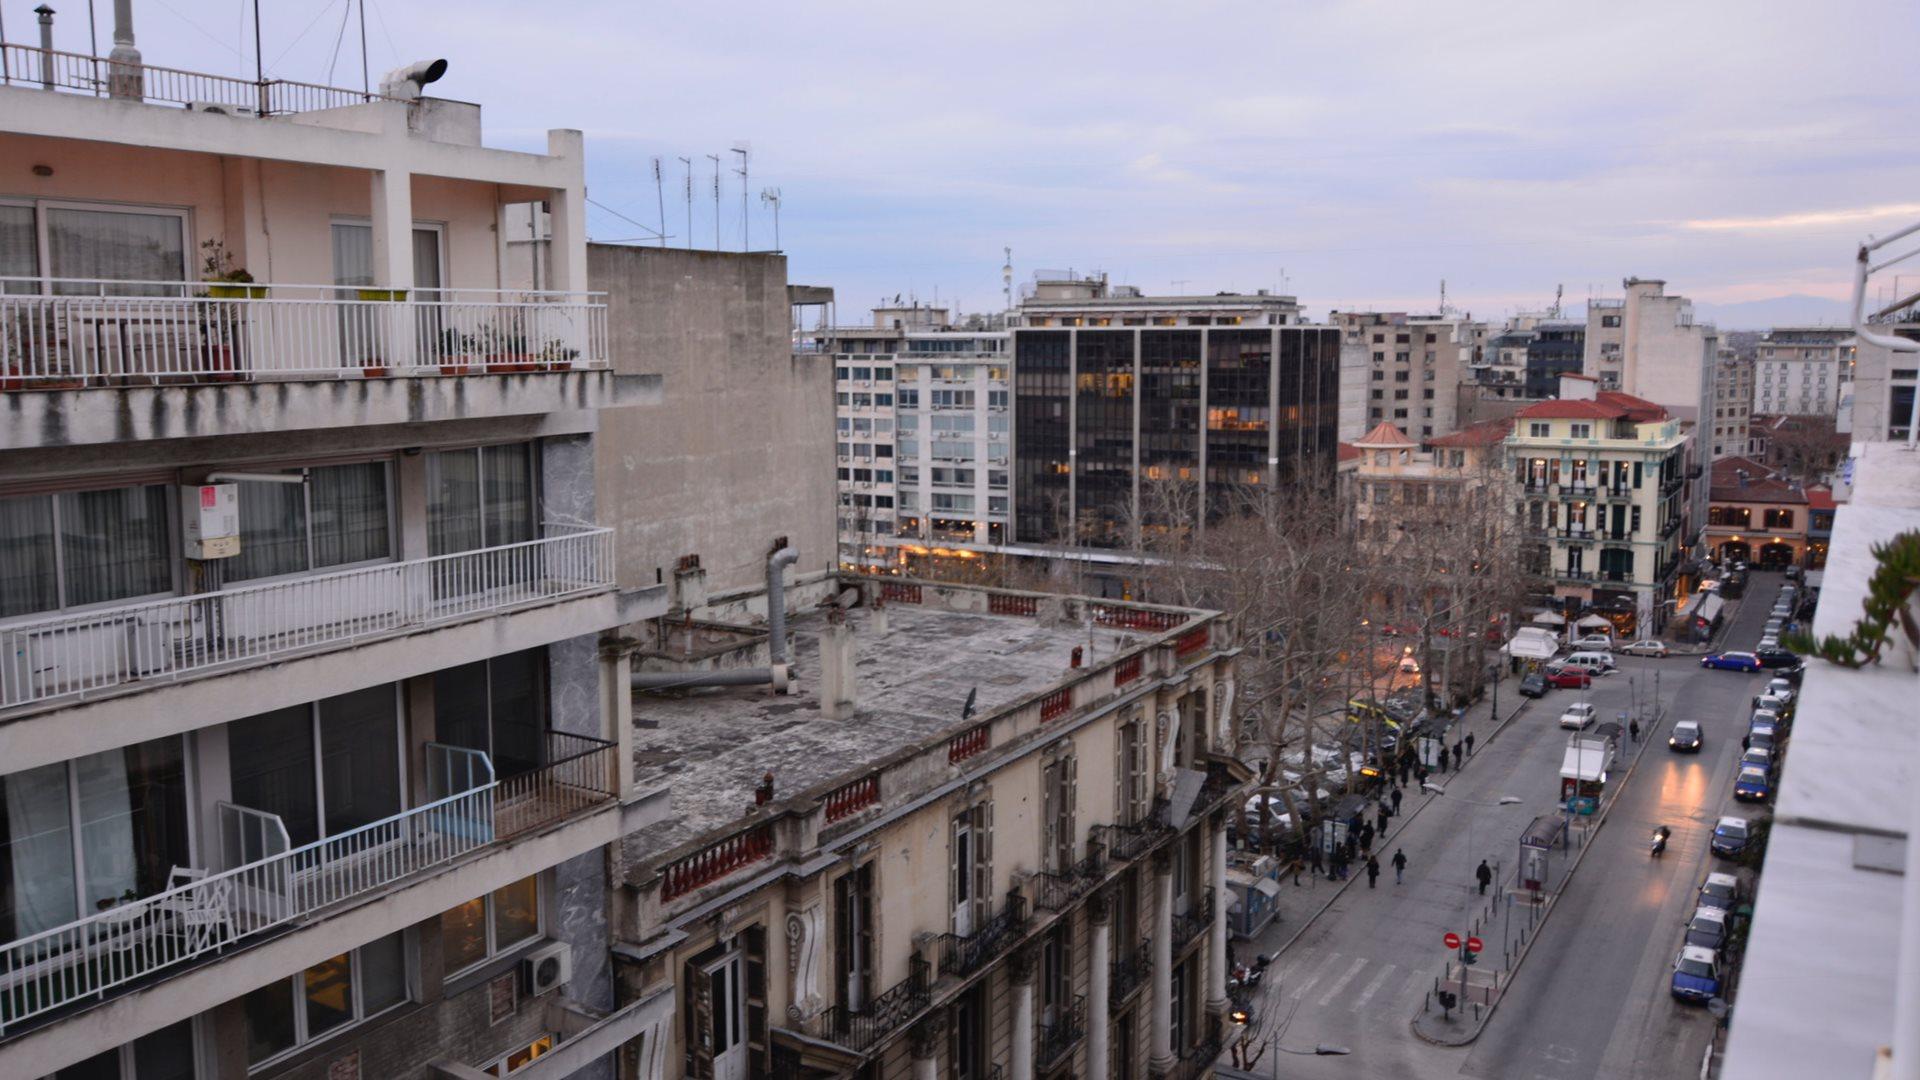 B12-Roof-Loft-1080.jpg